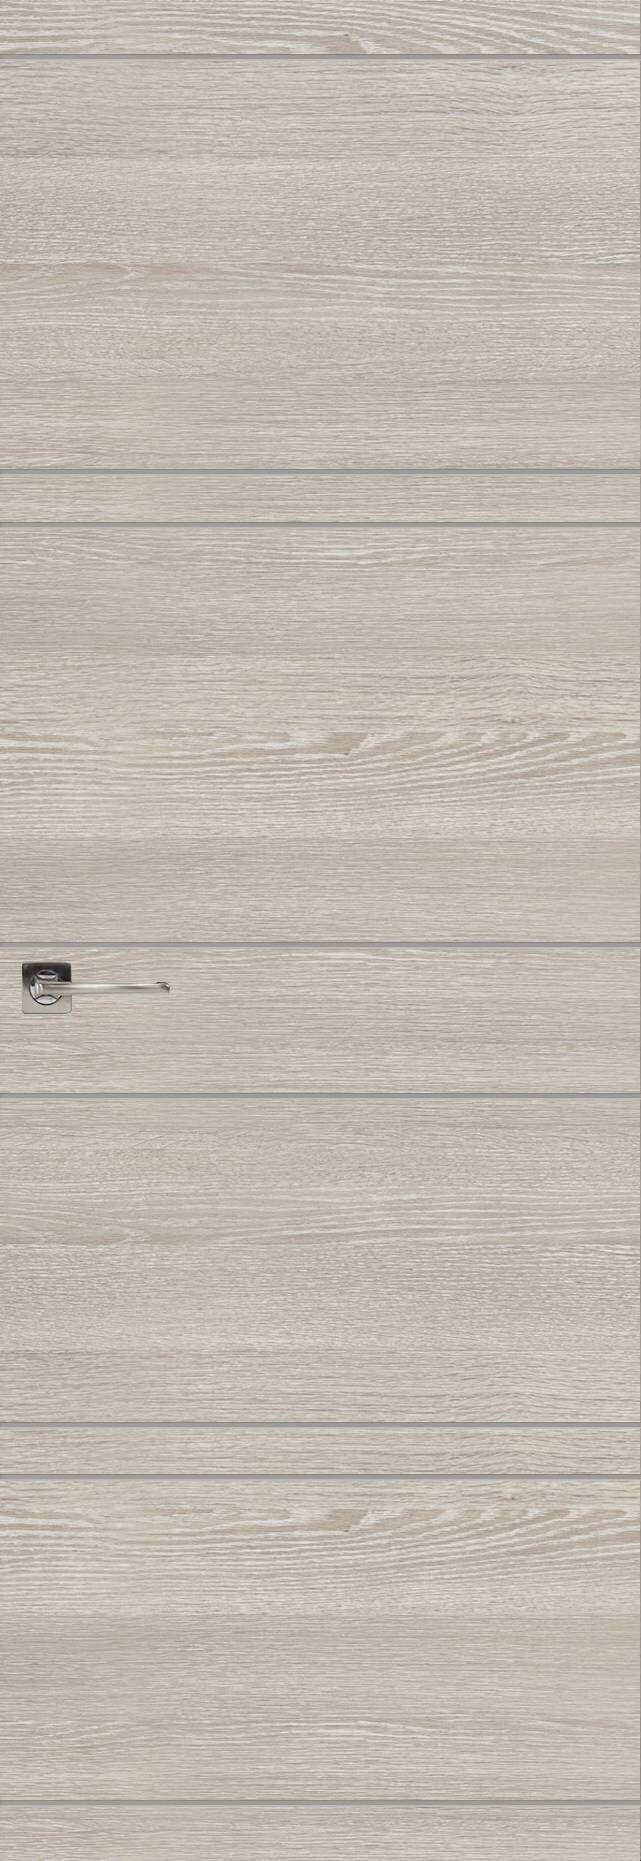 Tivoli Е-2 Invisible цвет - Серый дуб Без стекла (ДГ)